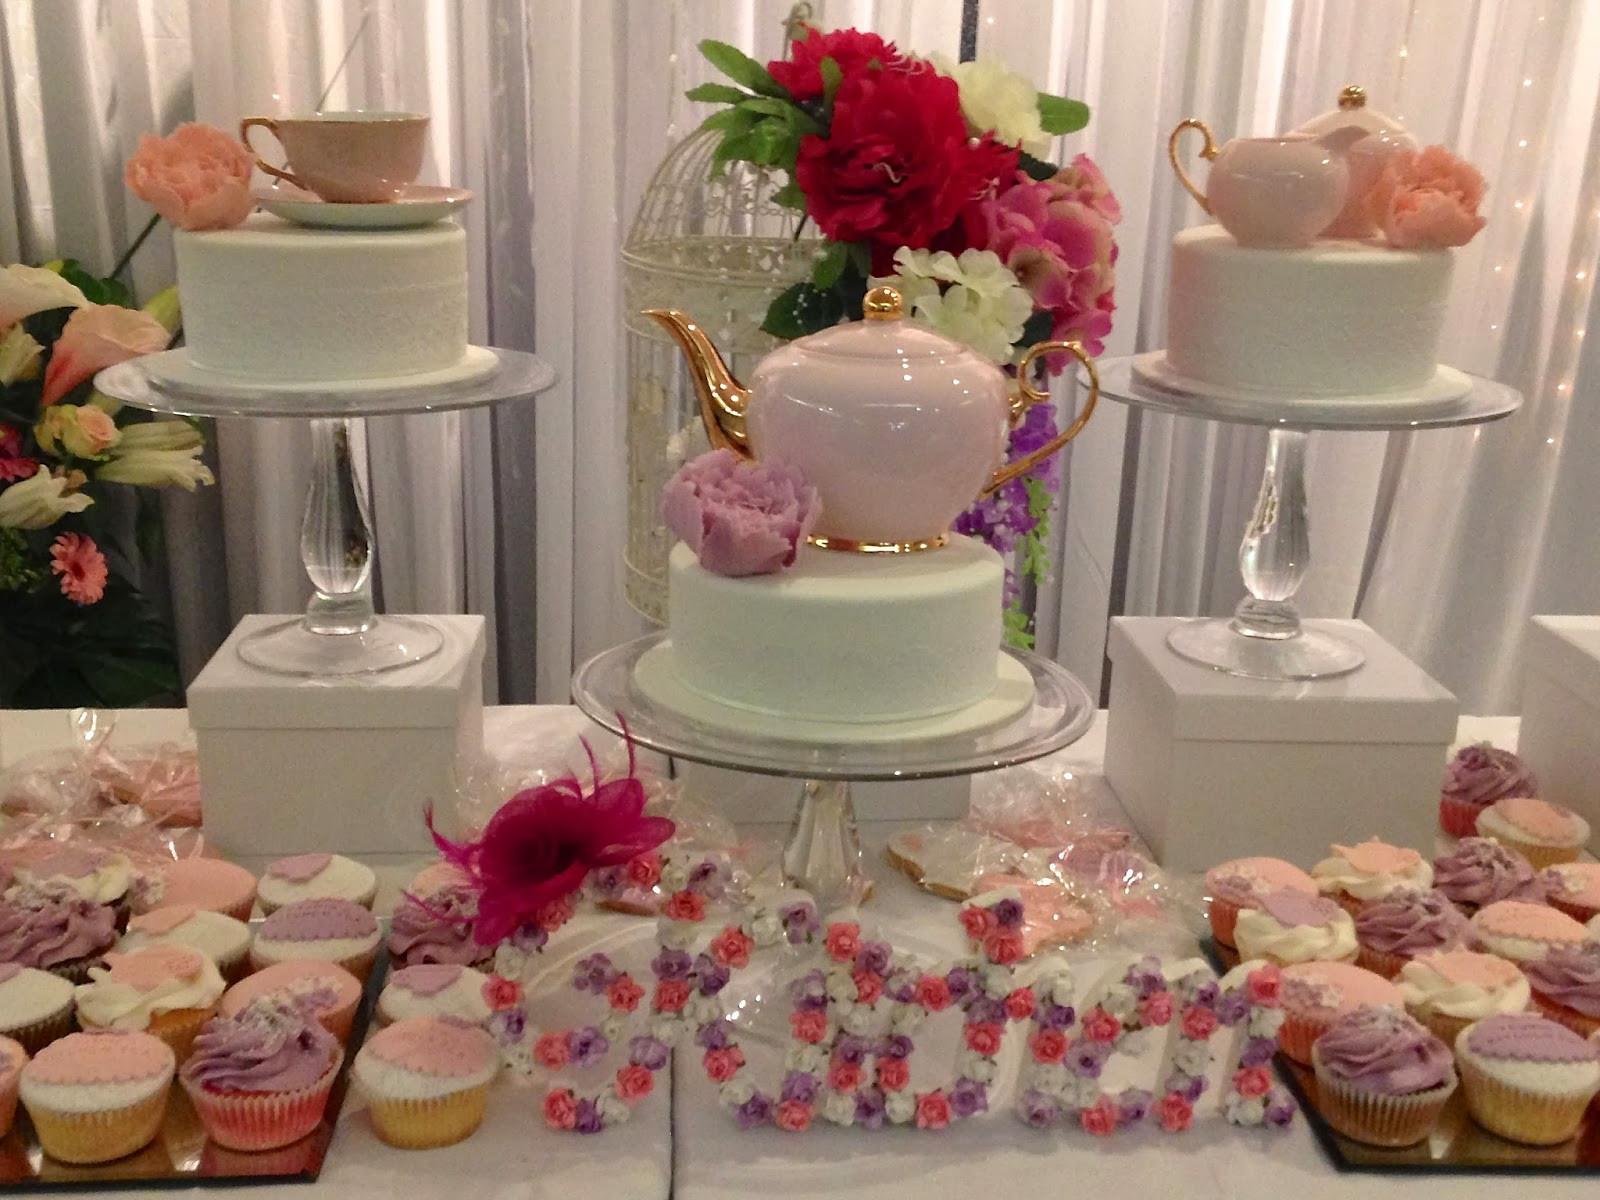 Tea Party Themes Ideas  Party Ideas Pretty in pink floral kitchen tea ideas